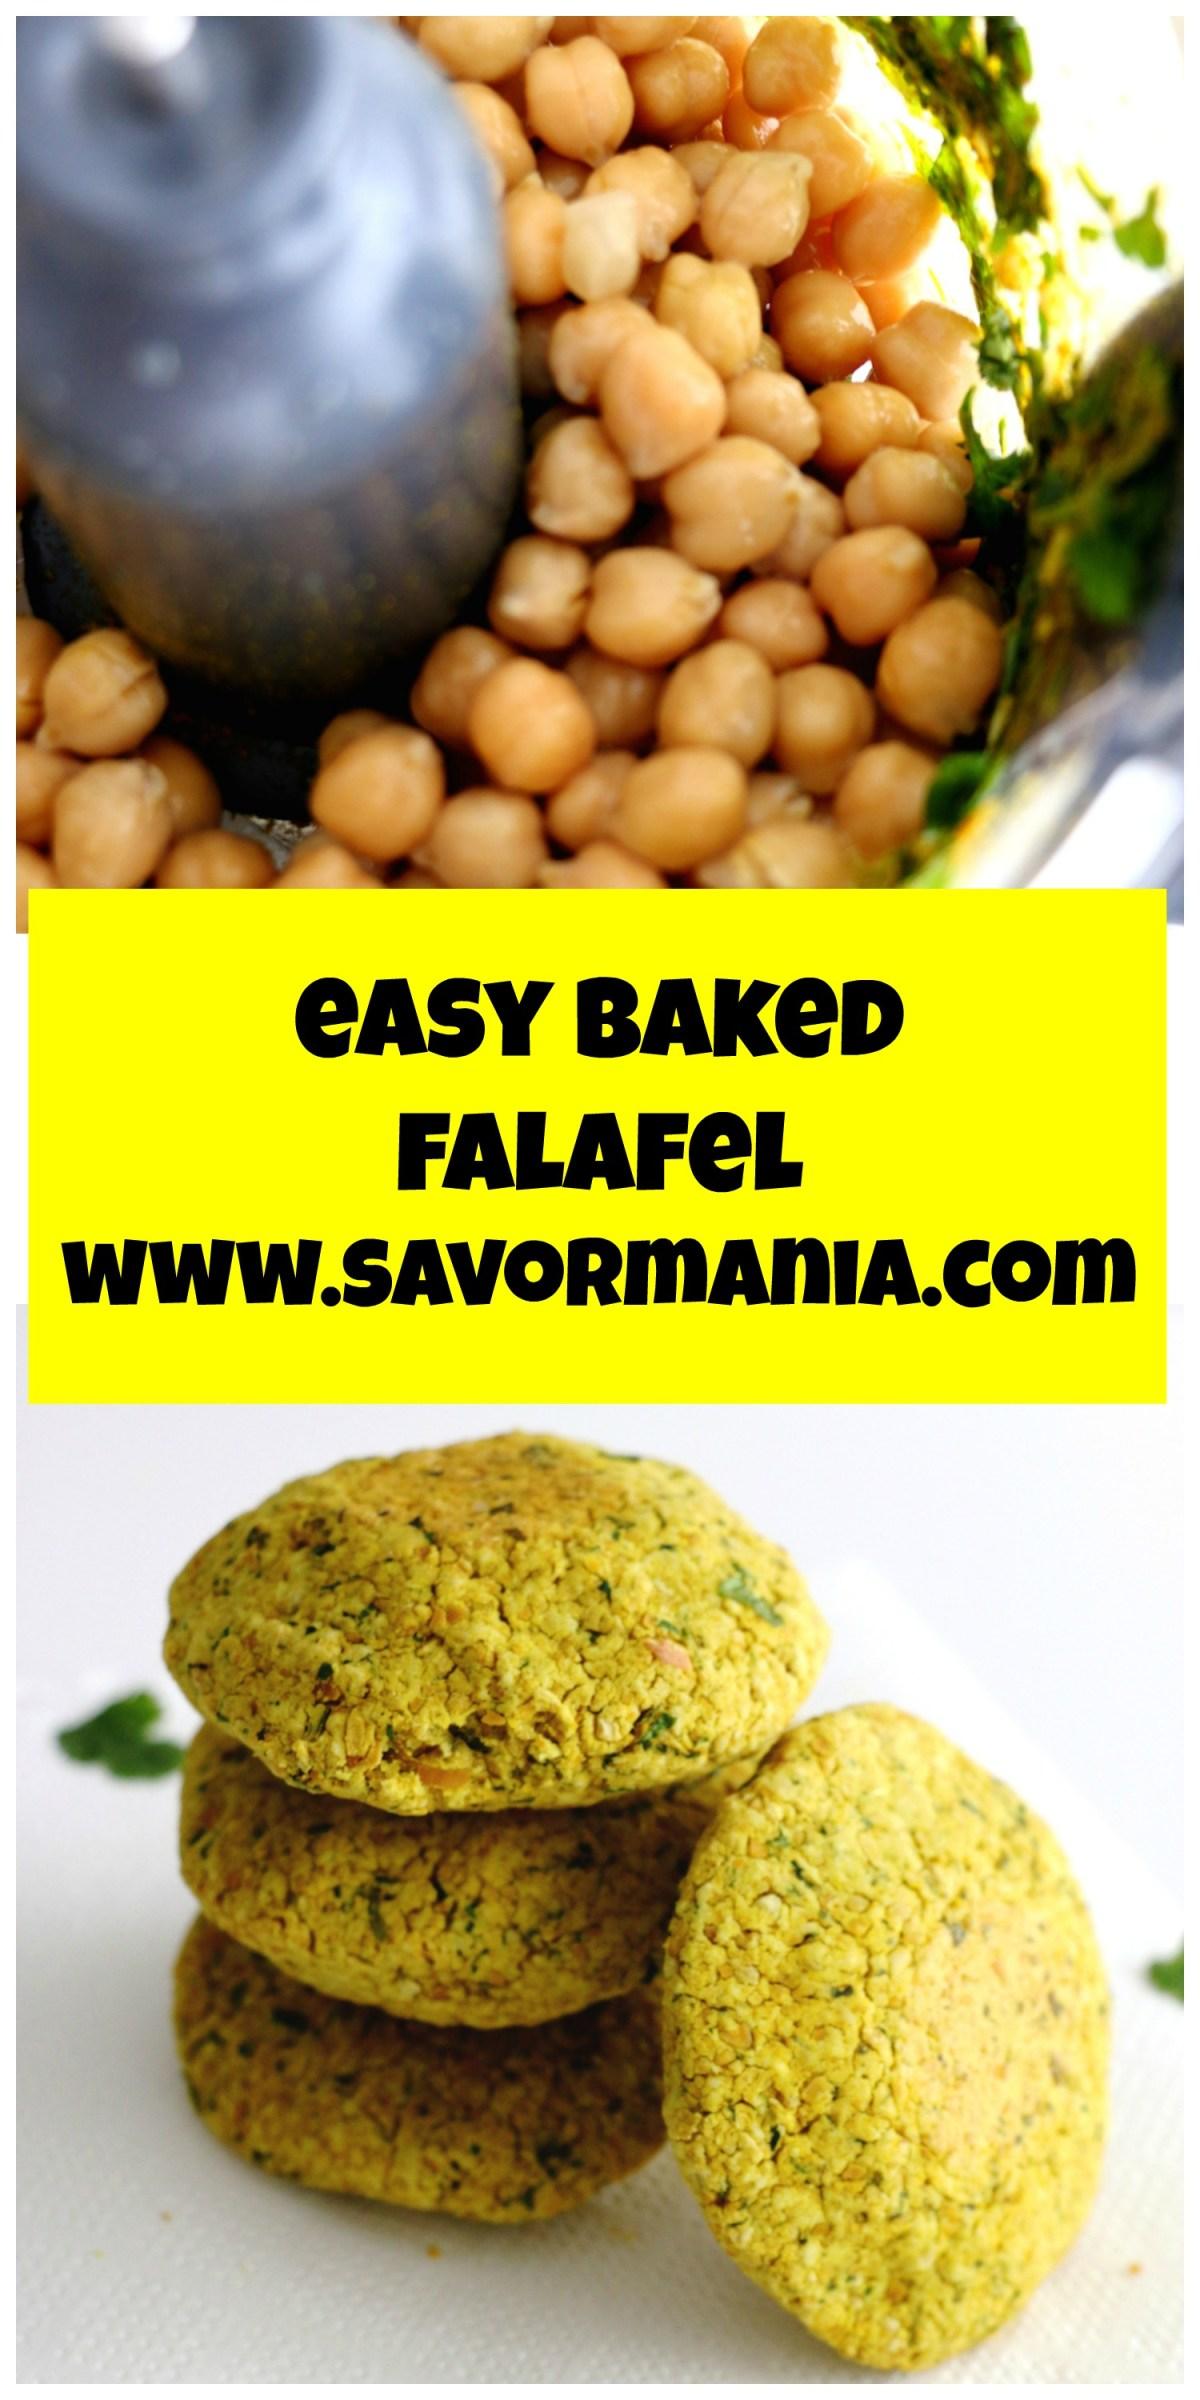 falafels au four | www.savormania.com